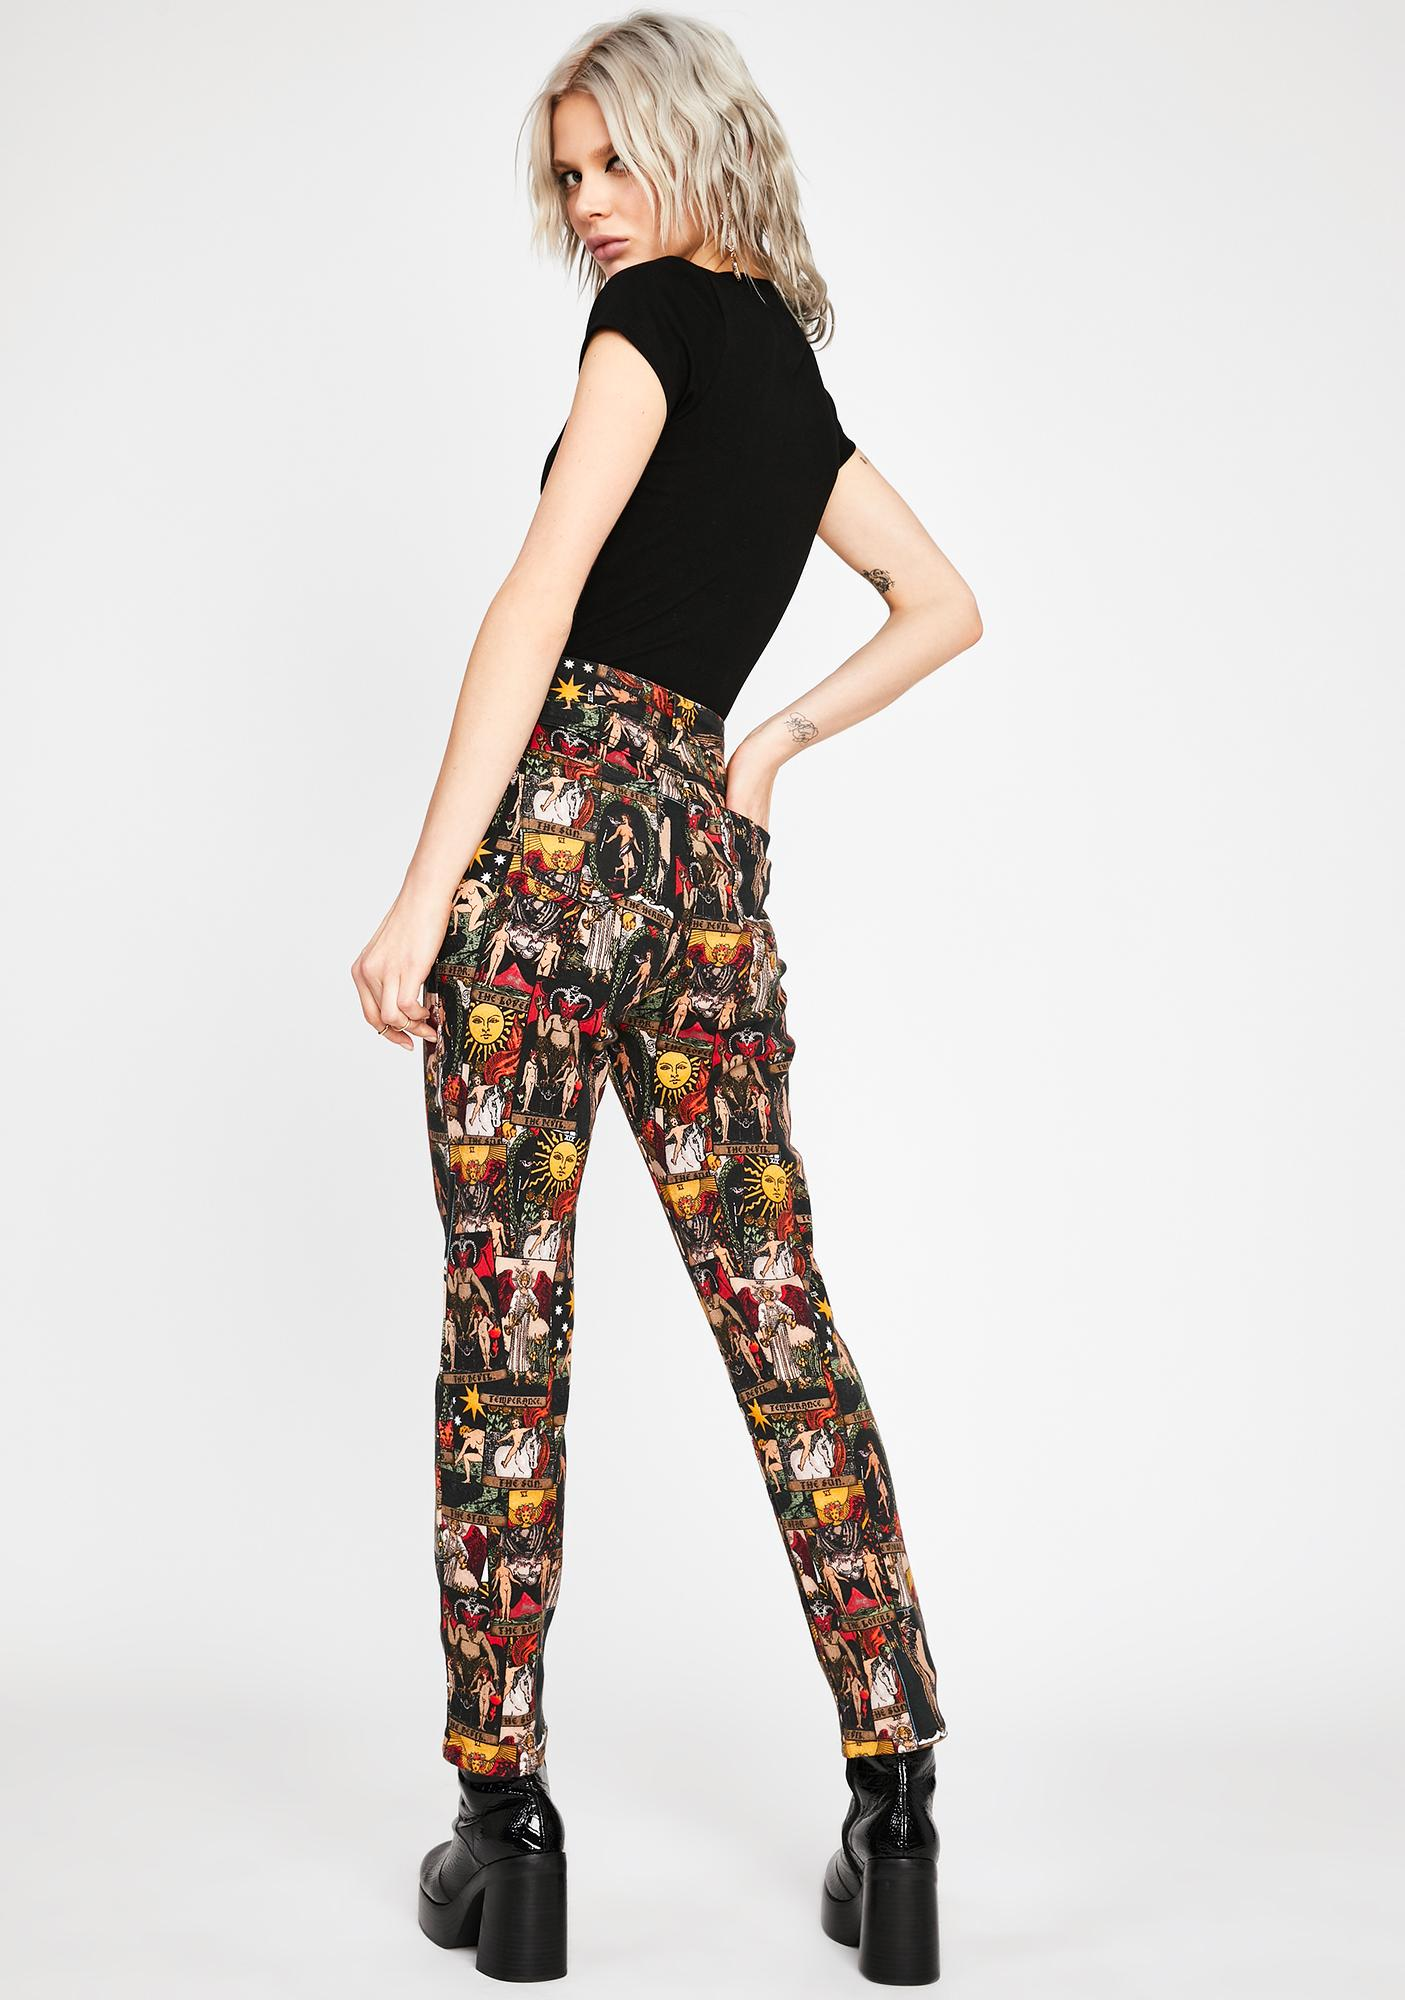 HOROSCOPEZ Divine Insight Mom Jeans